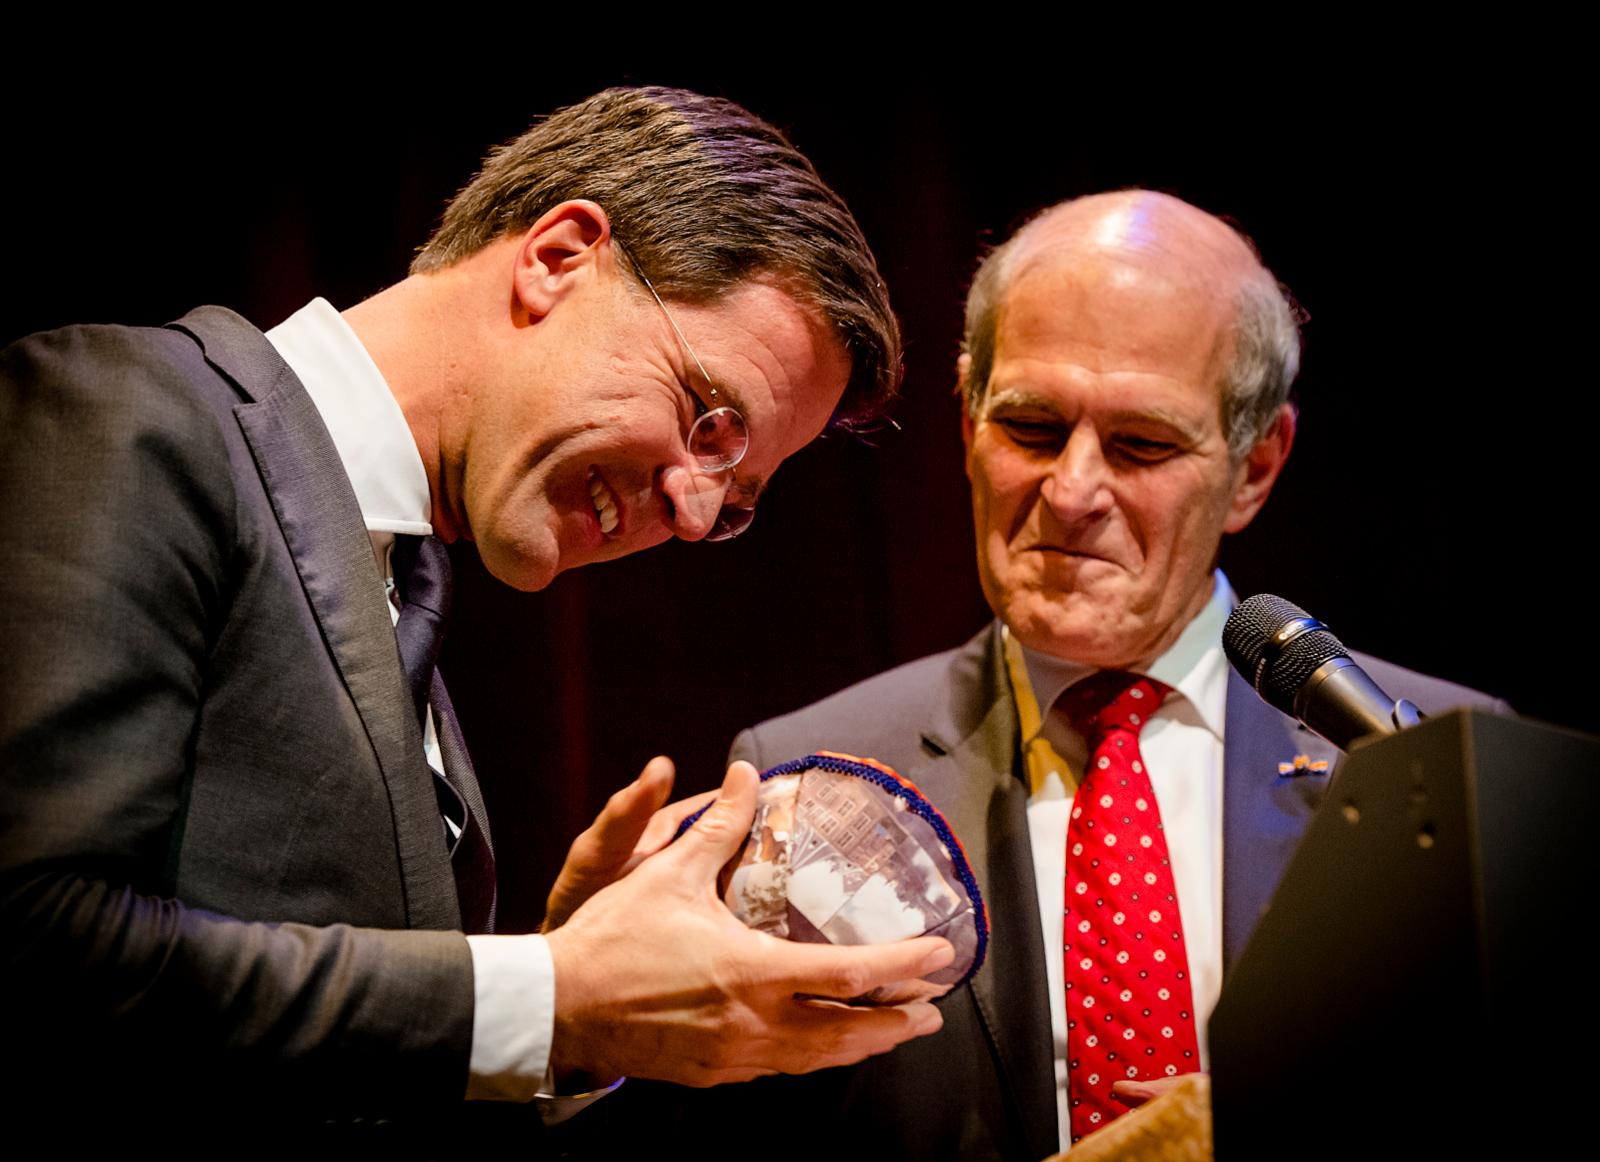 40 jaar CIDI: Premier Mark Rutte krijgt een keppeltje. Foto Robin van Lonkhuijsen/ANP